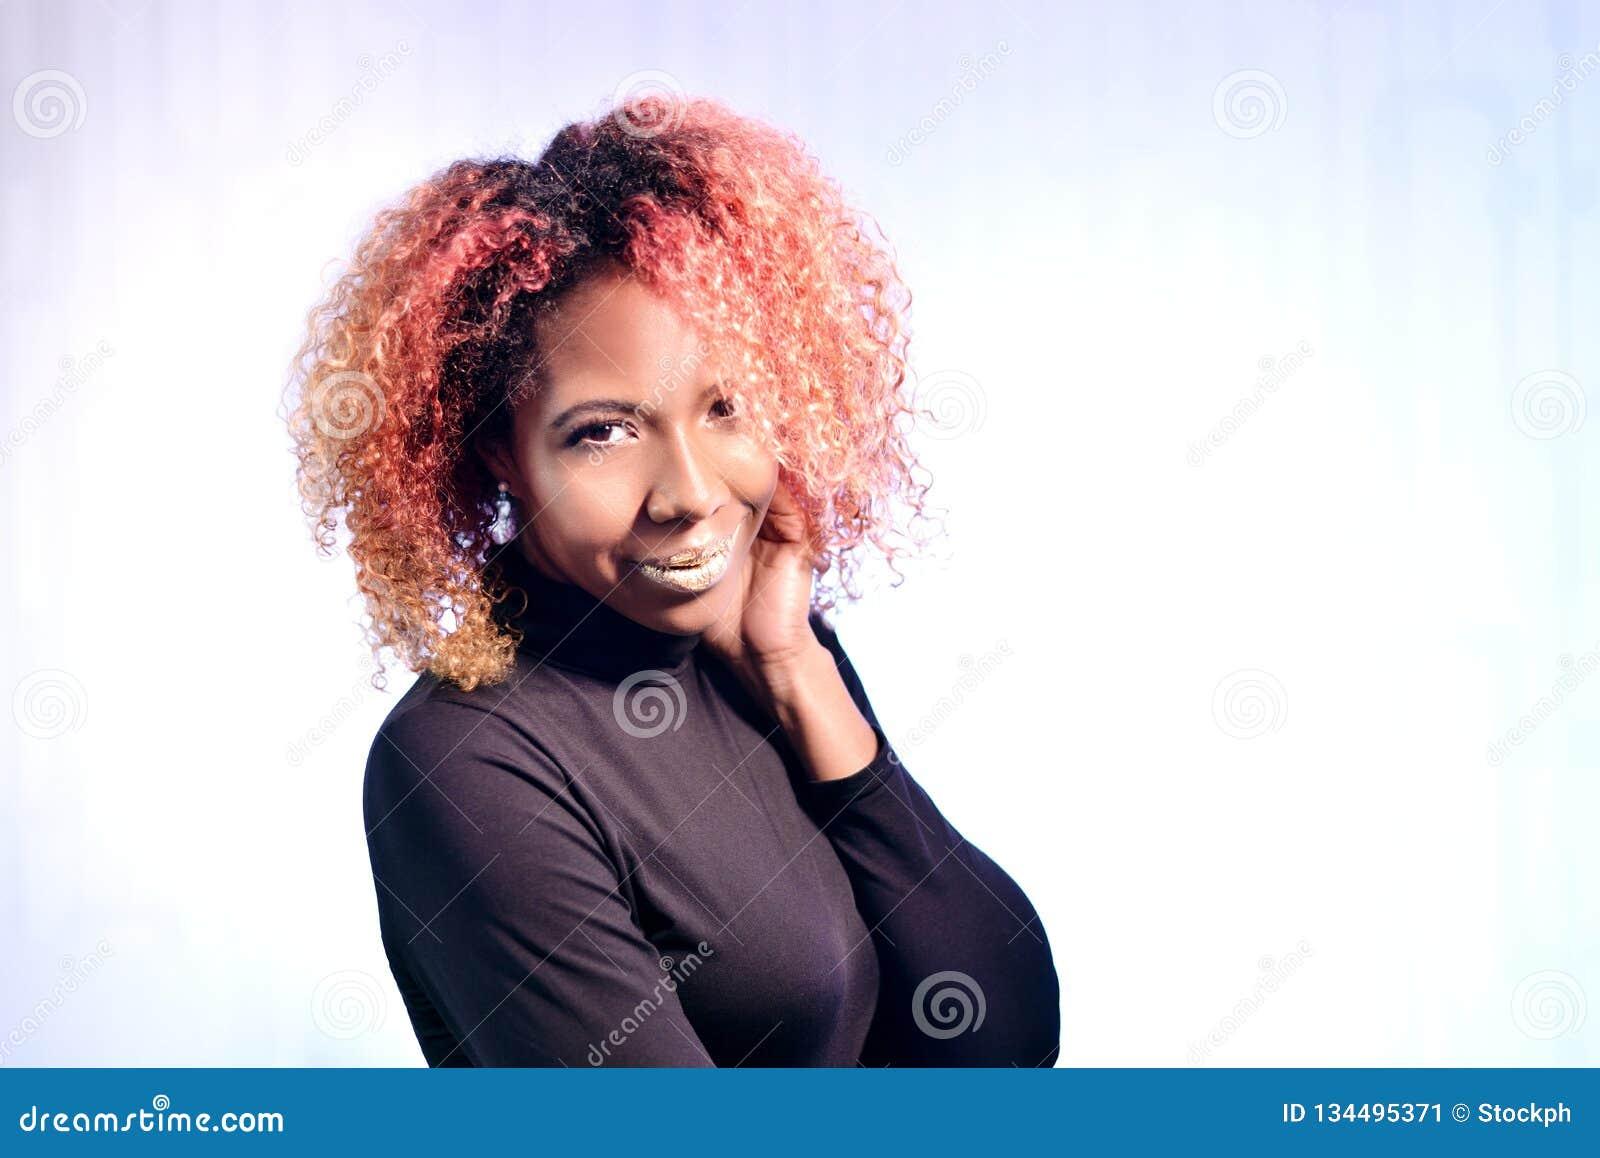 Portret van vrij Afrikaans mooi meisje met rode krullende prachtige hai